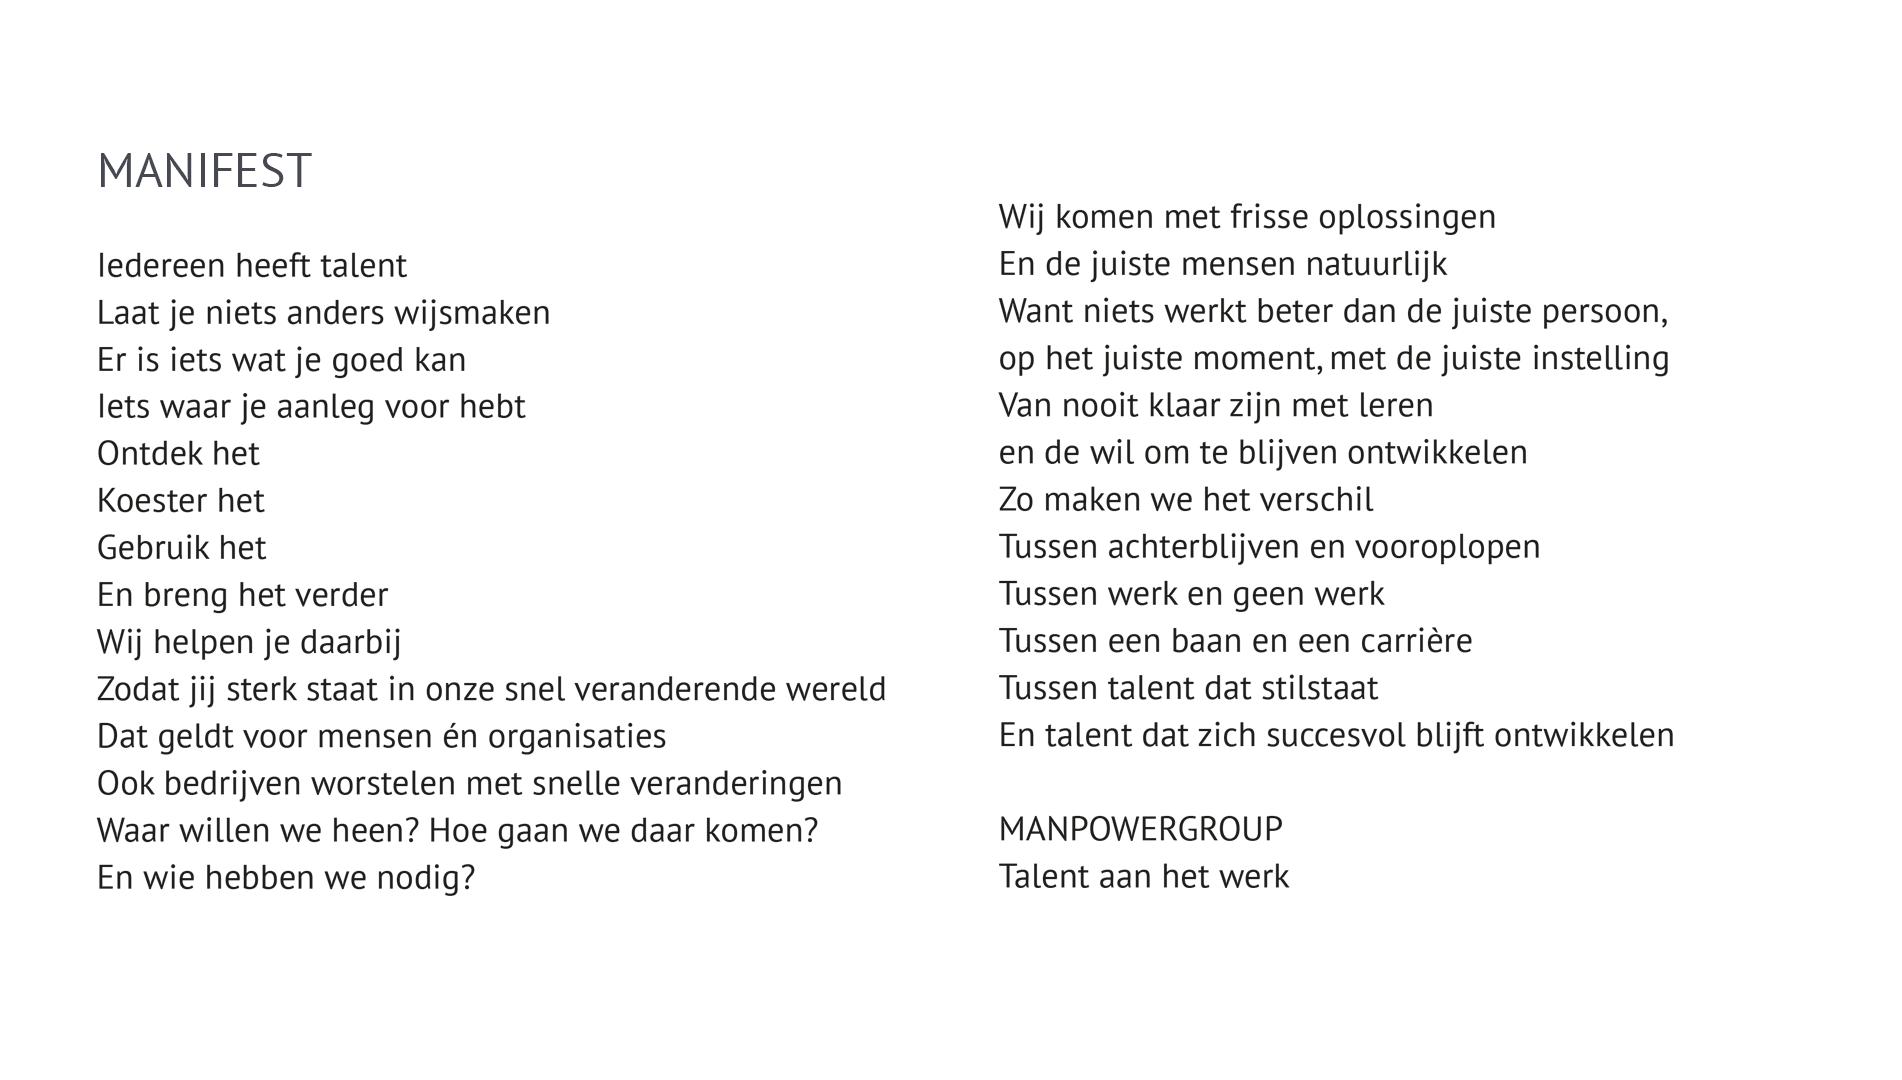 MPG-manifest